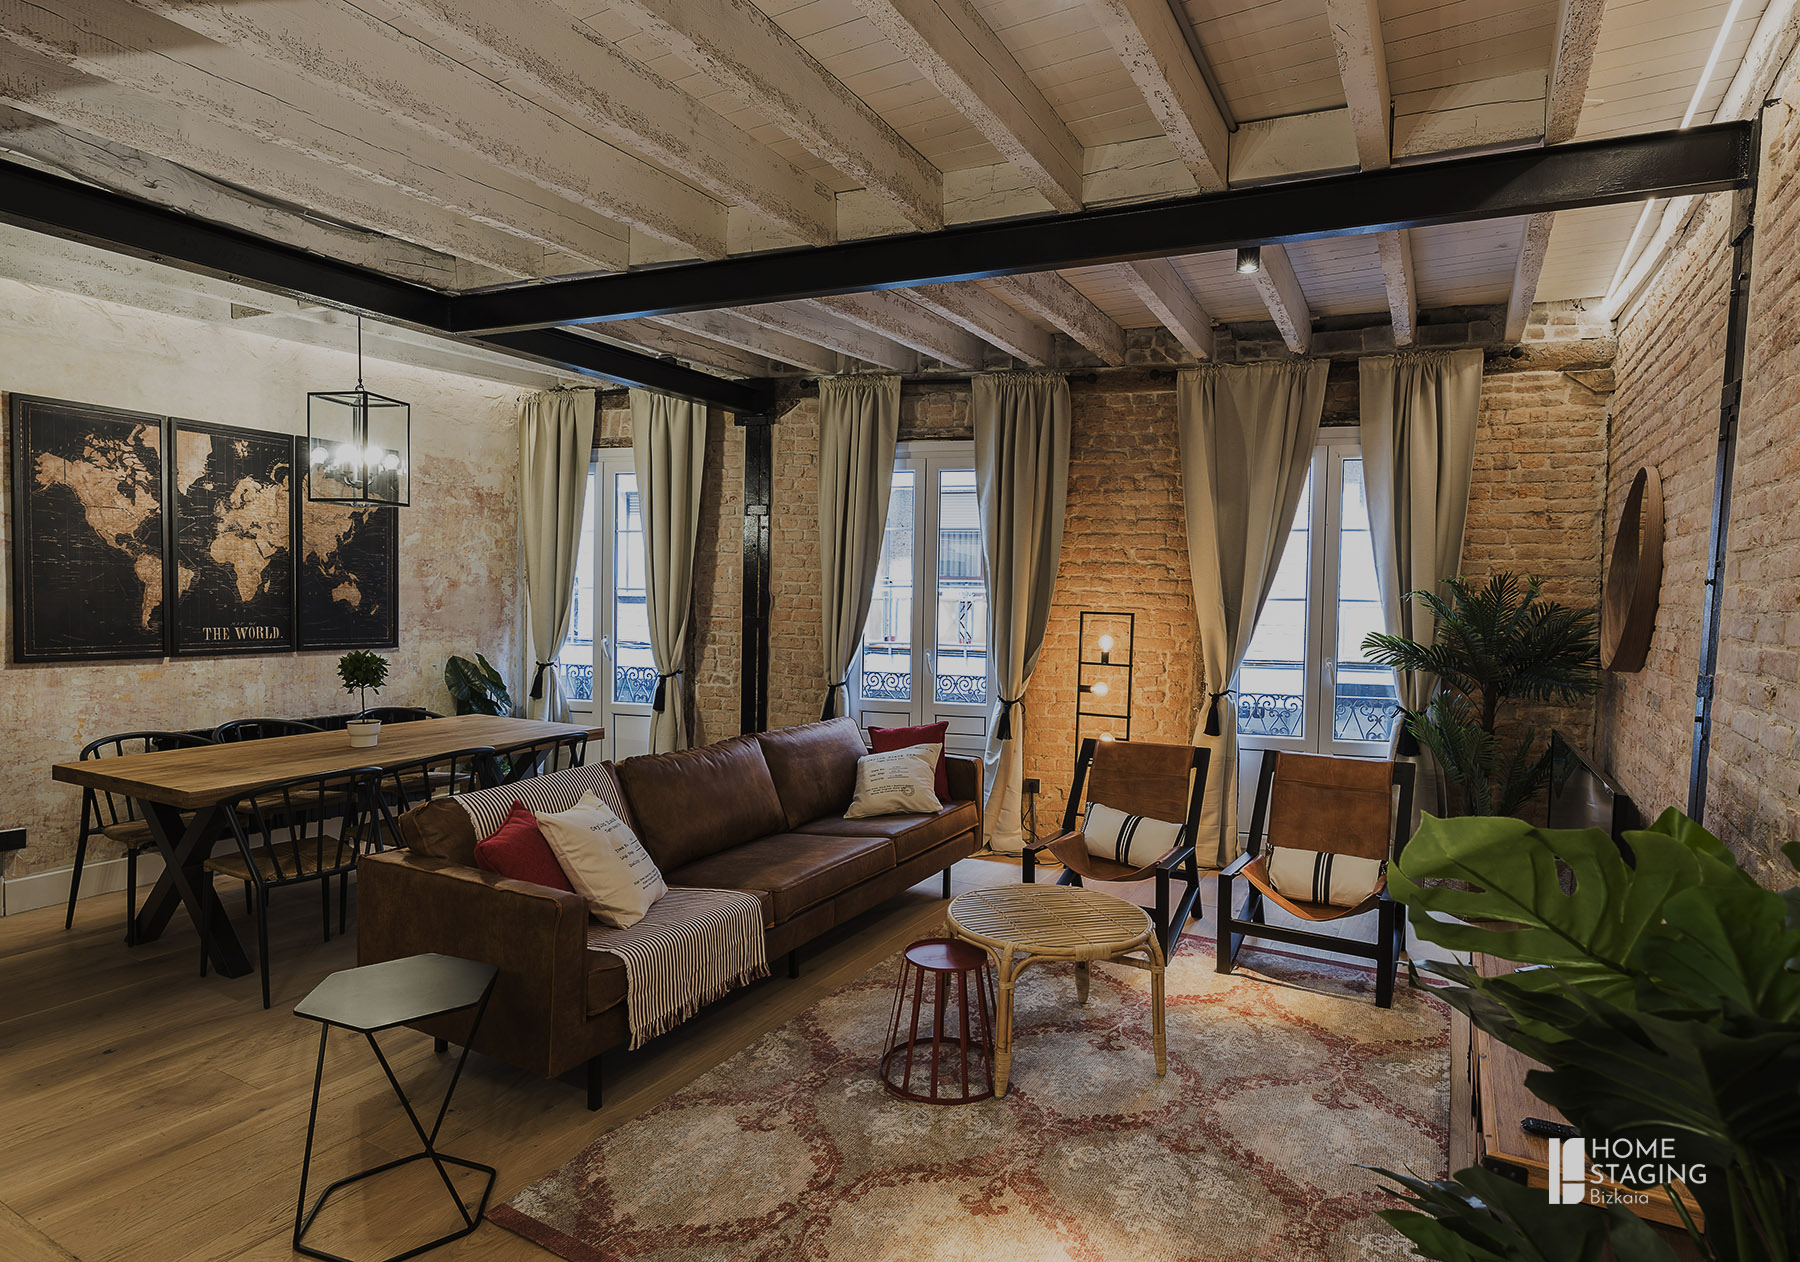 decorar-para-alquilar-airbnnb-bilbao